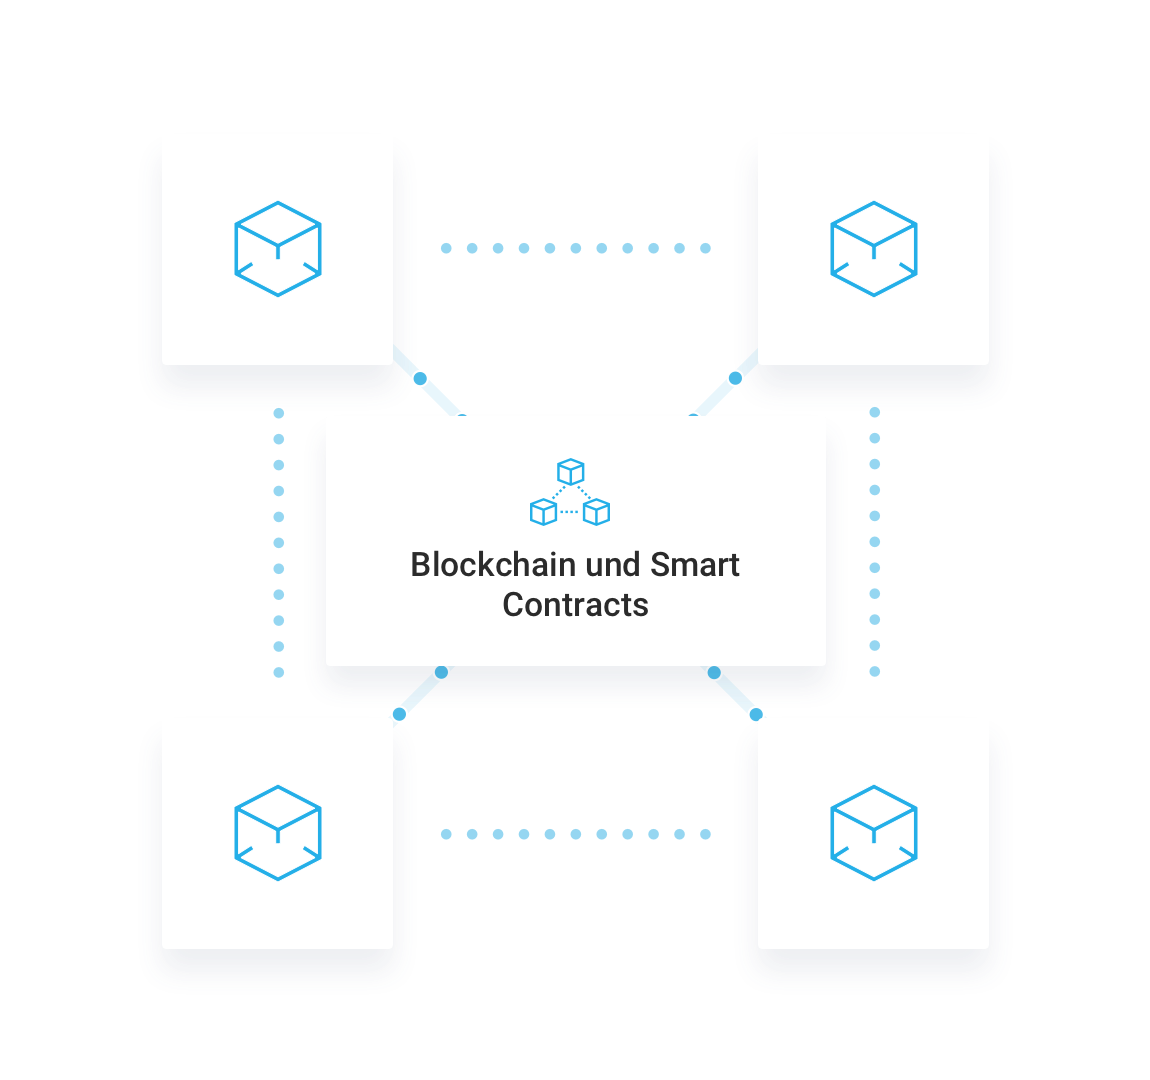 Blockchain-Technologien